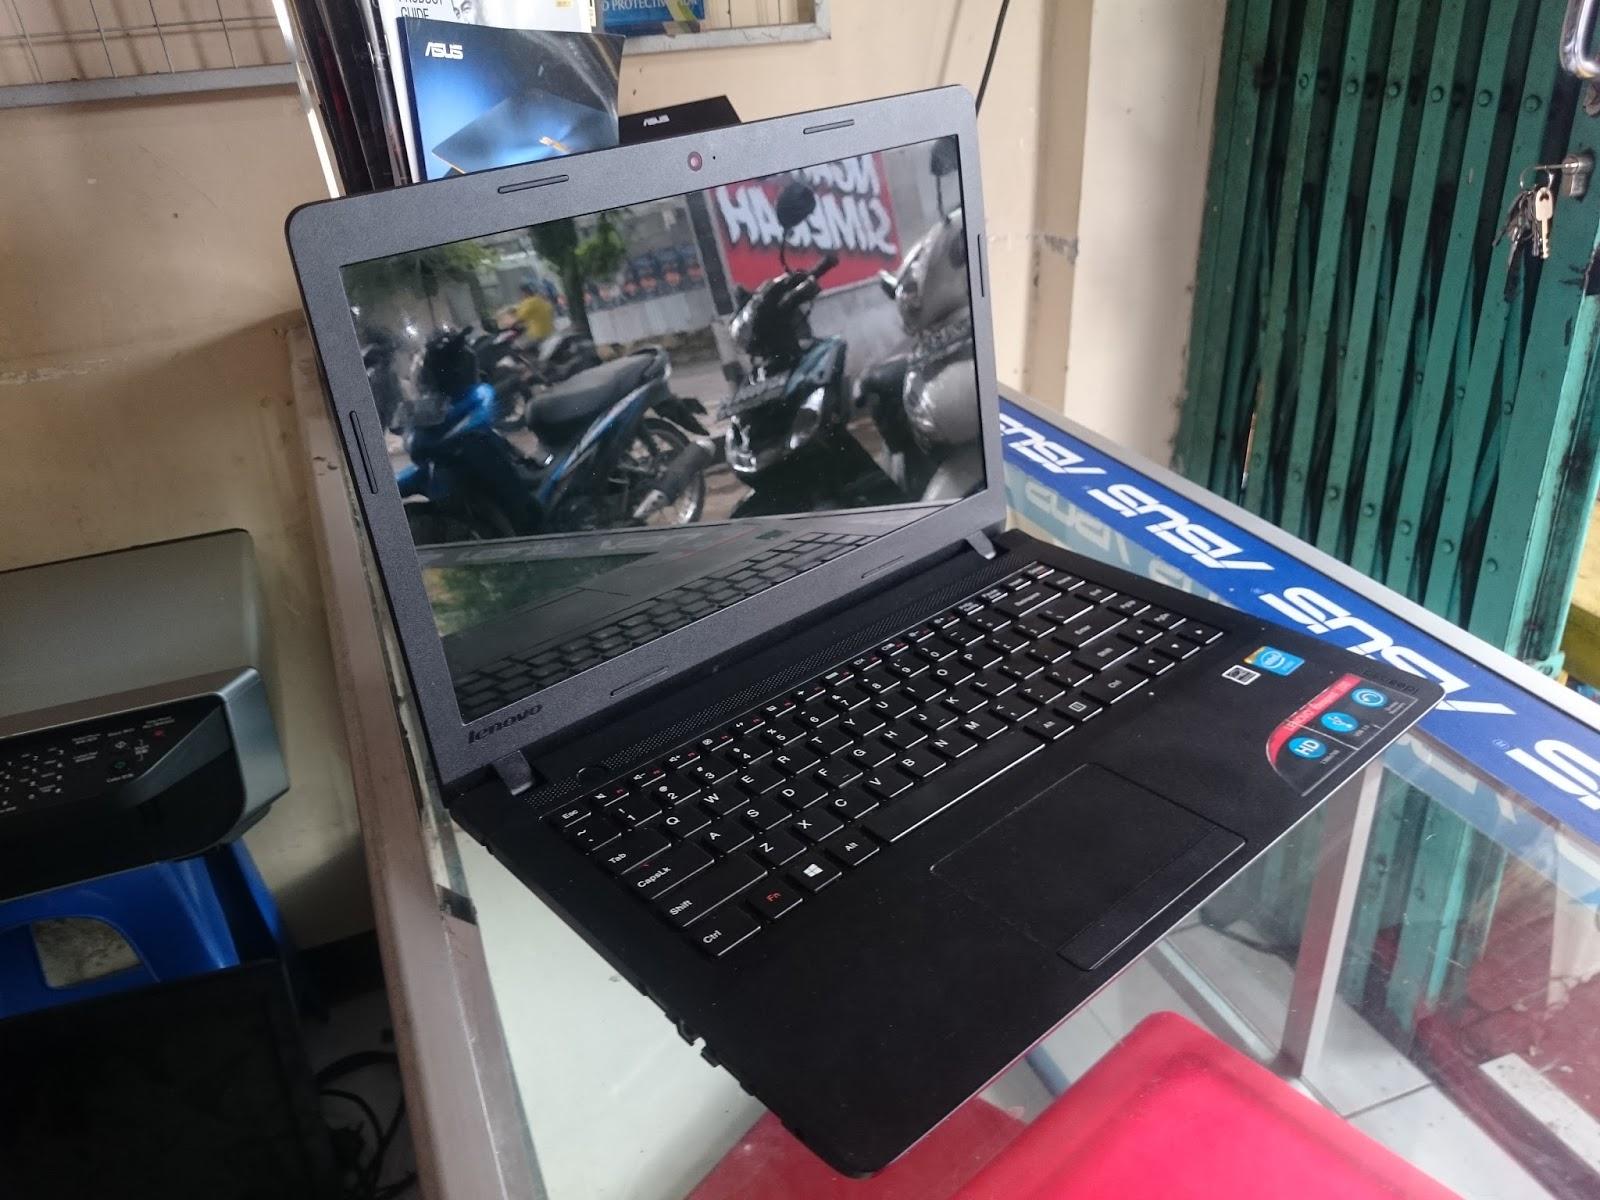 All software lengkap tinggal pakai kelengkapan Unit Laptop Charger Tas Harga Lenovo IdeaPad 100 Rp 2 600 000 SOLD OUT sms wa Phone